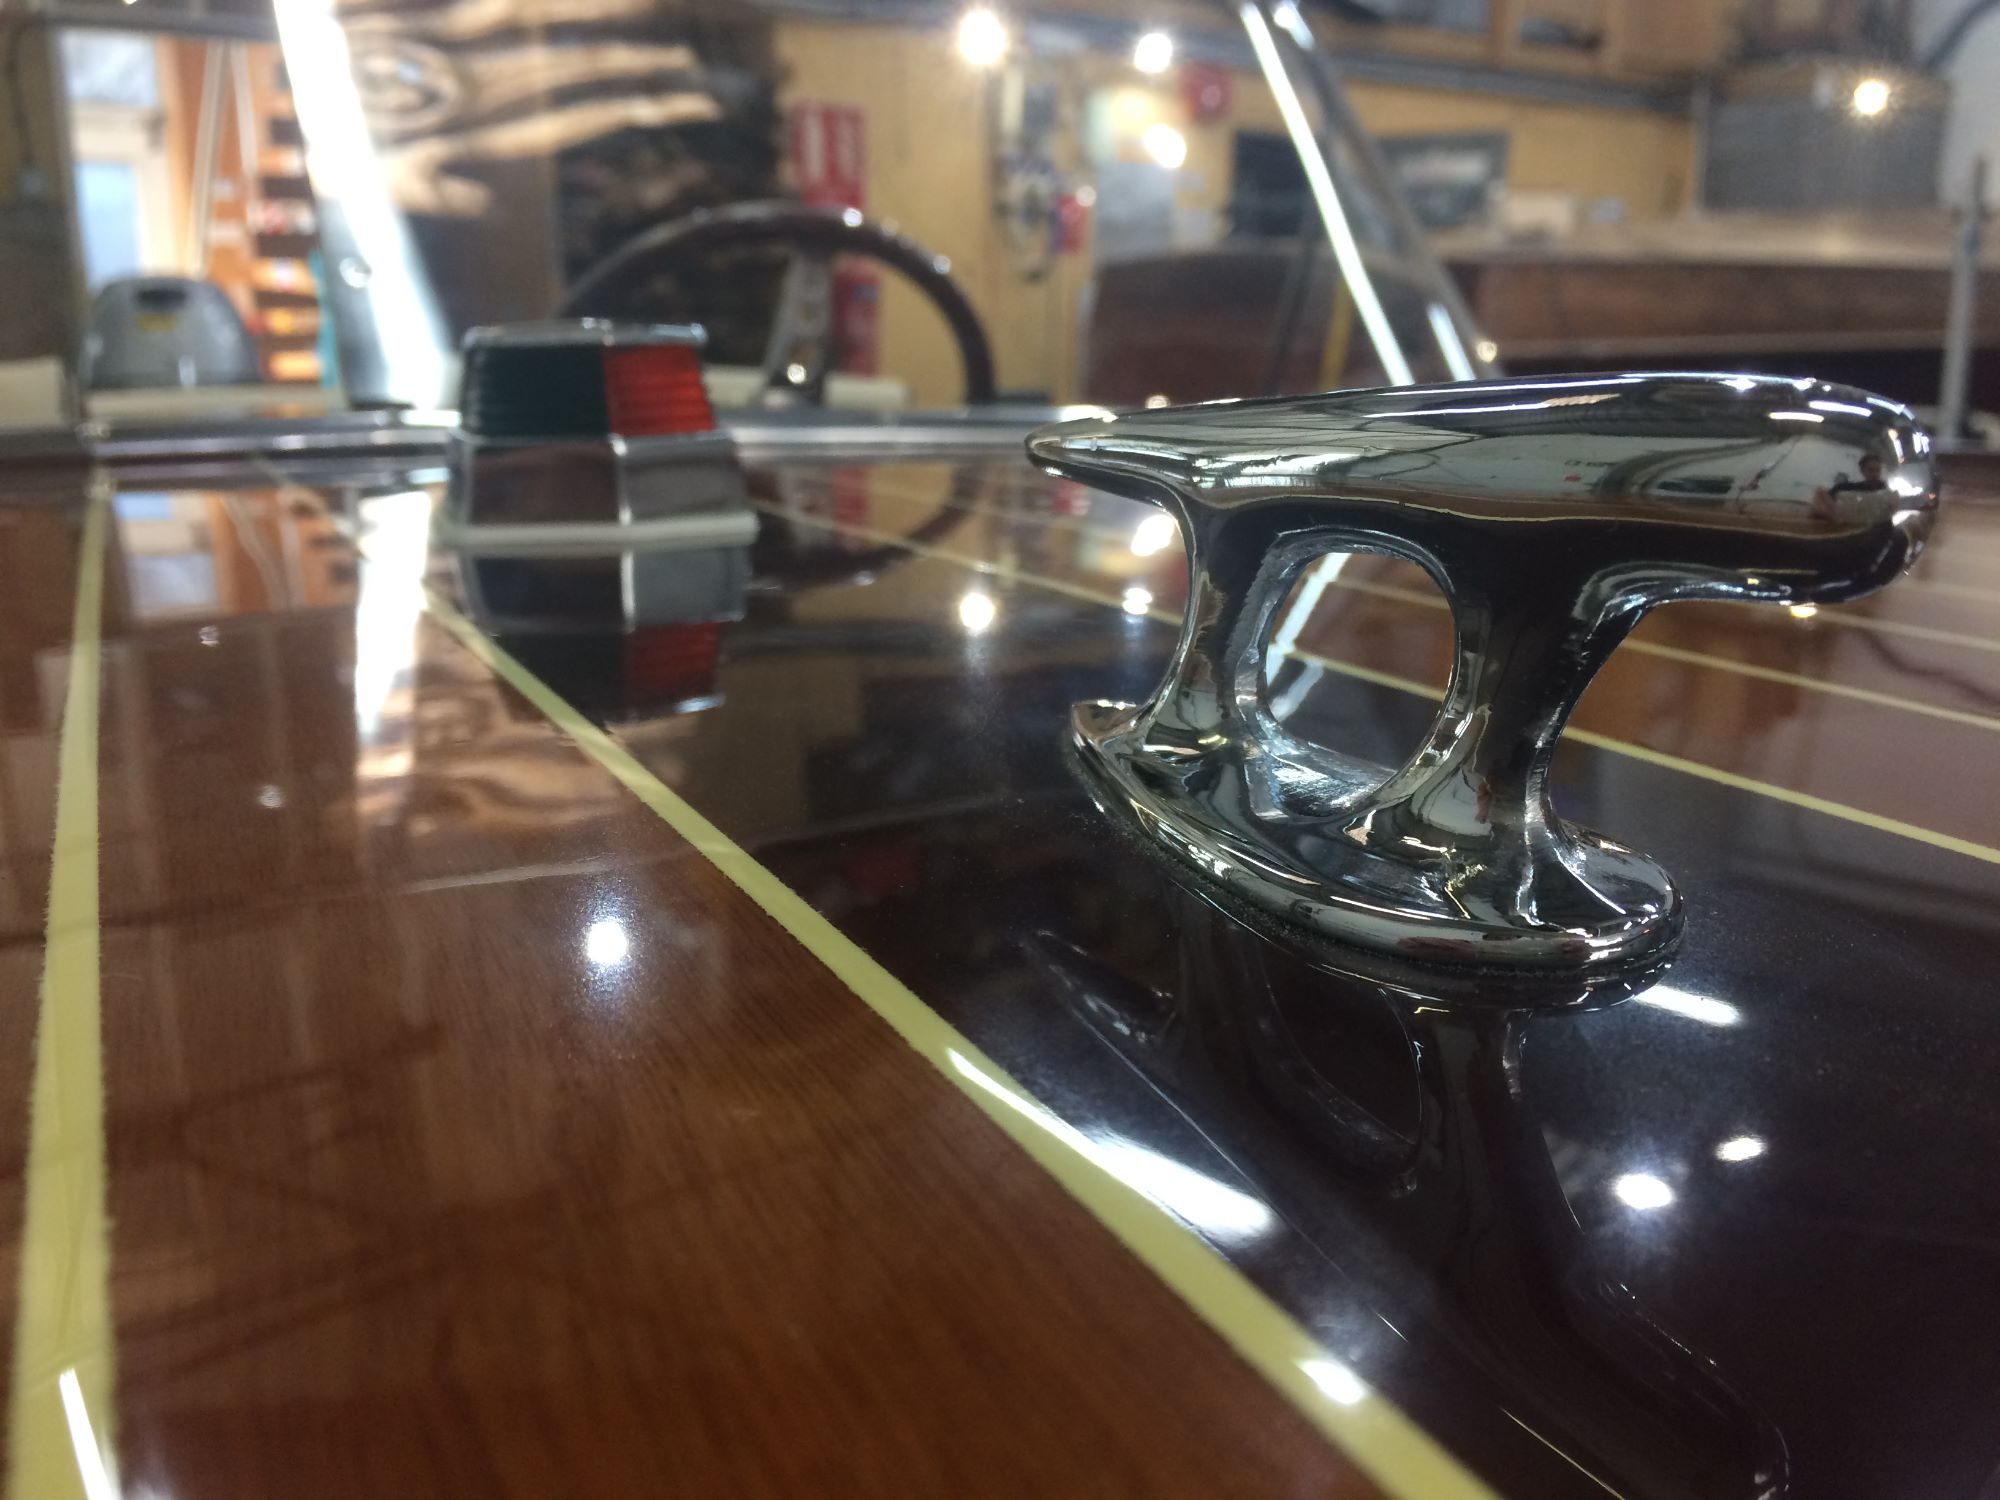 new chrome fittings on this broom viking speedboat